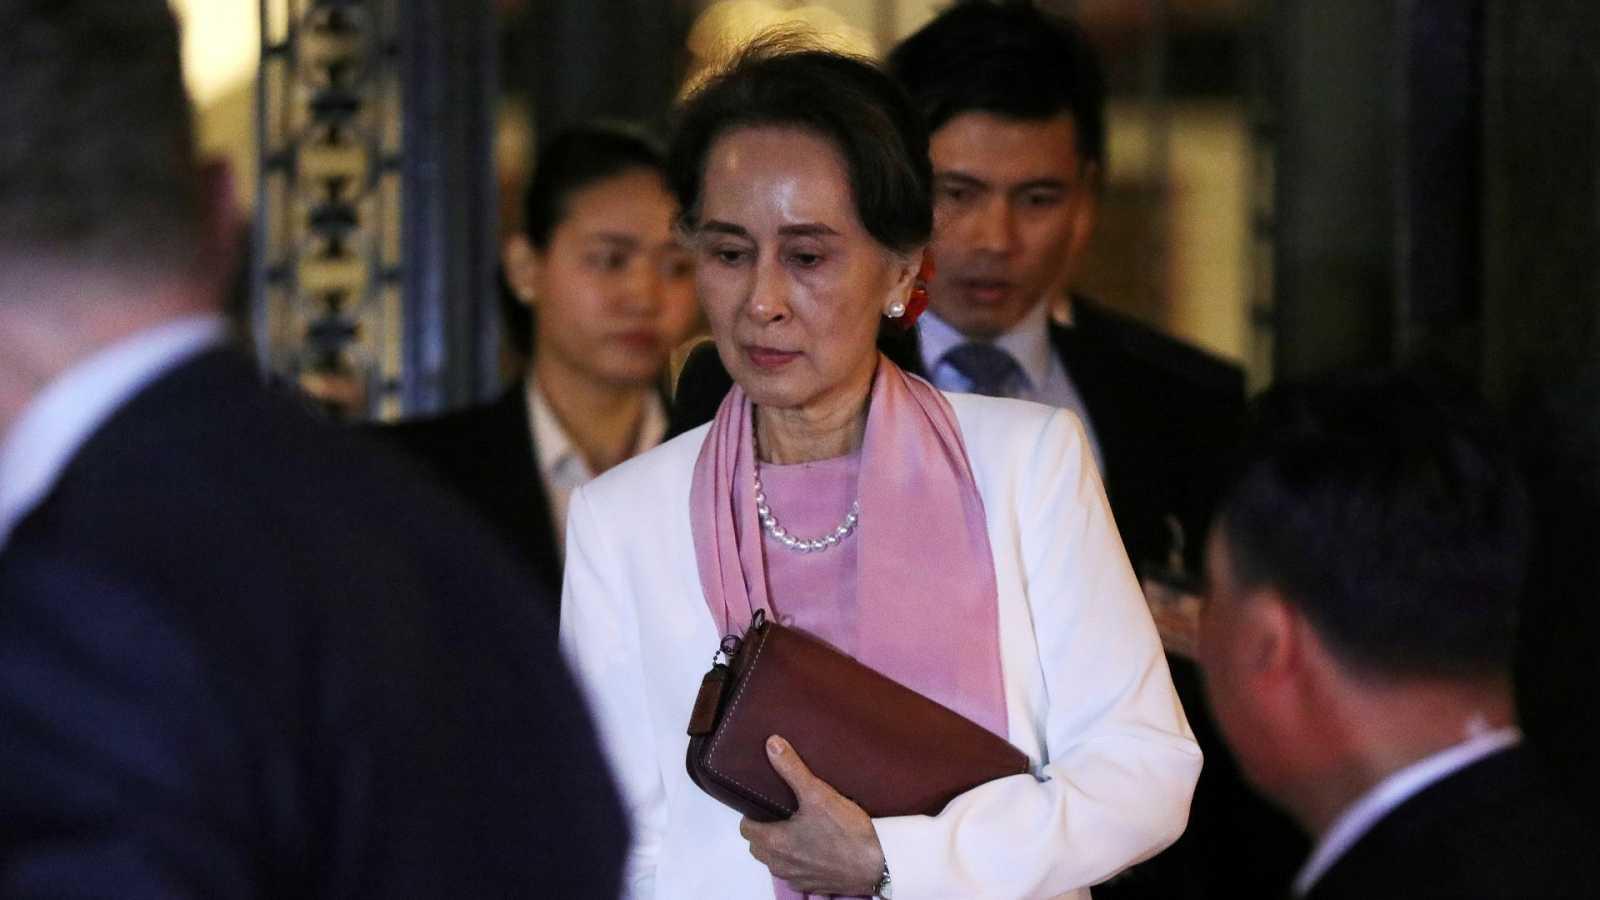 La Eurocámara retira el Sájarov a Aung San Suu Kyi